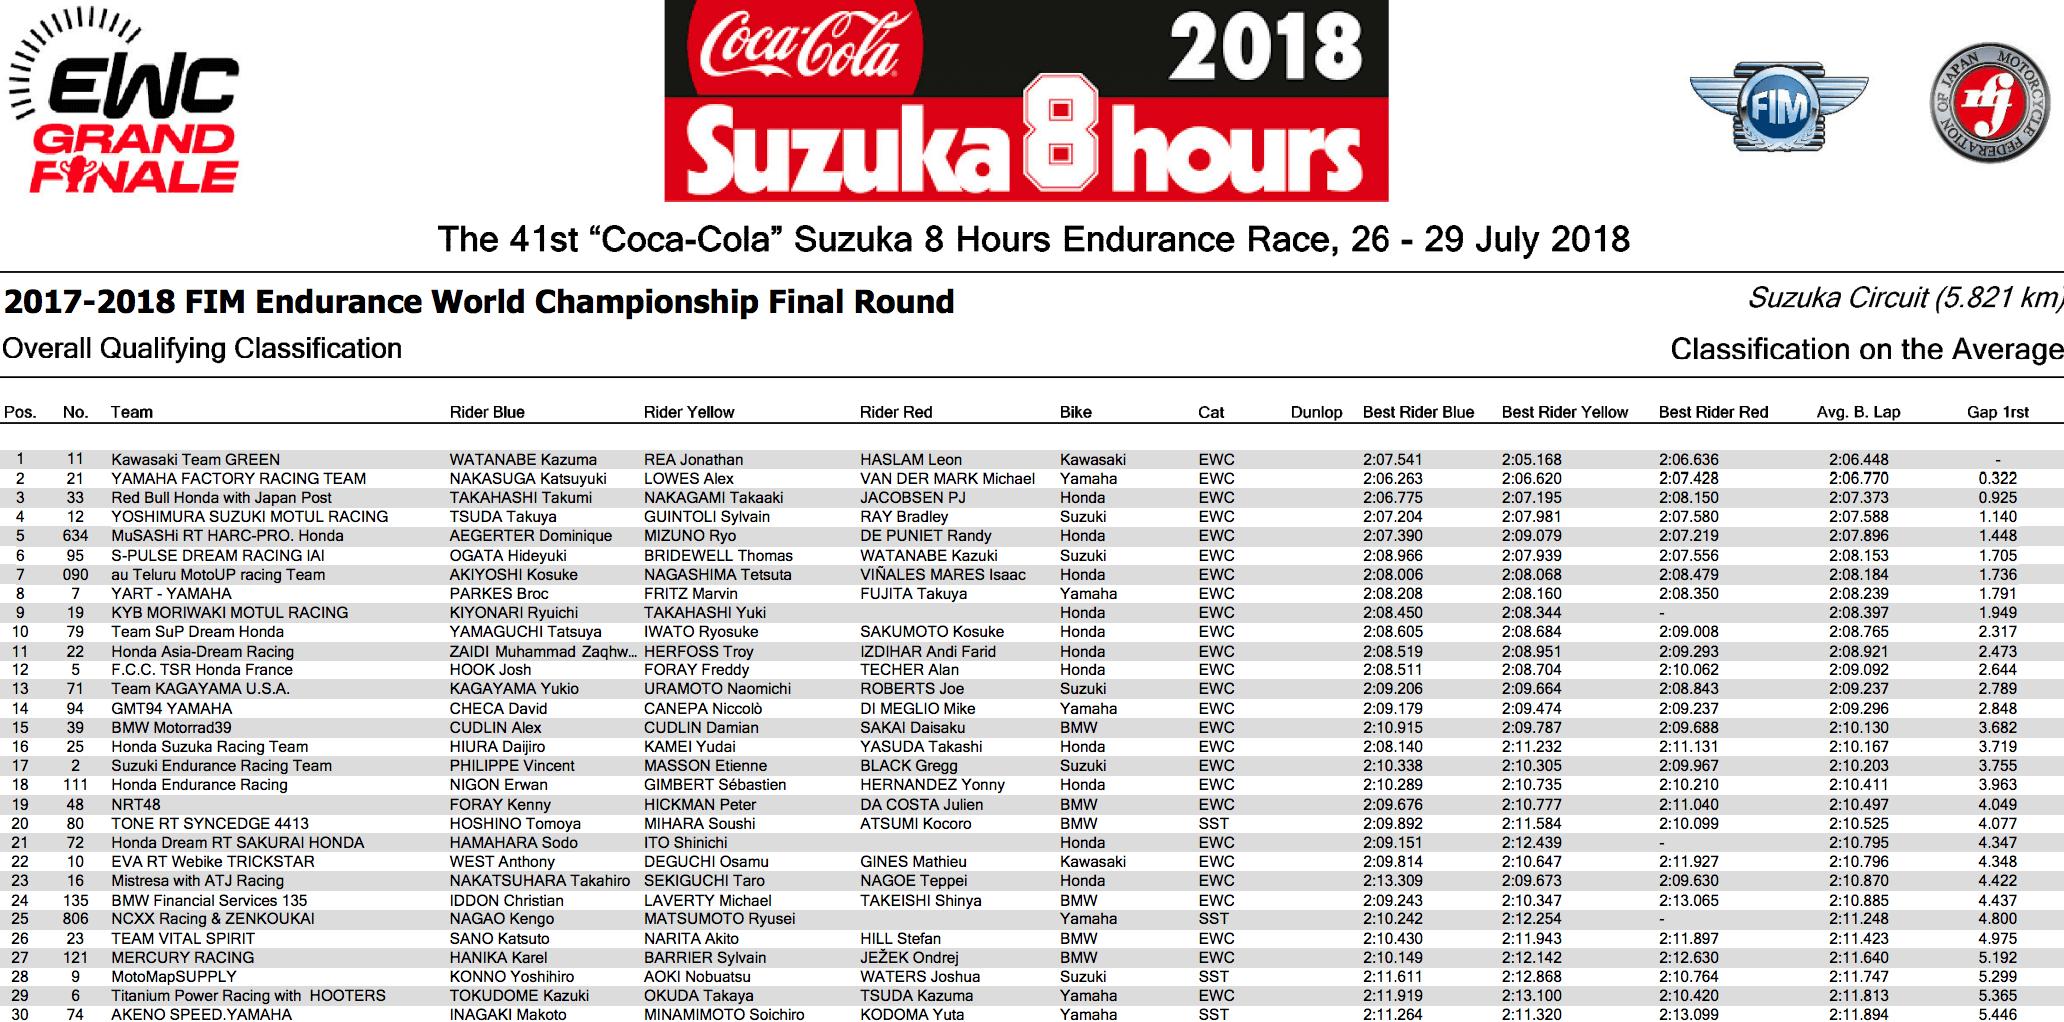 ★FIM世界耐久選手権シリーズ 鈴鹿8時間耐久 公式予選総合トップはKawasaki Team GREEN